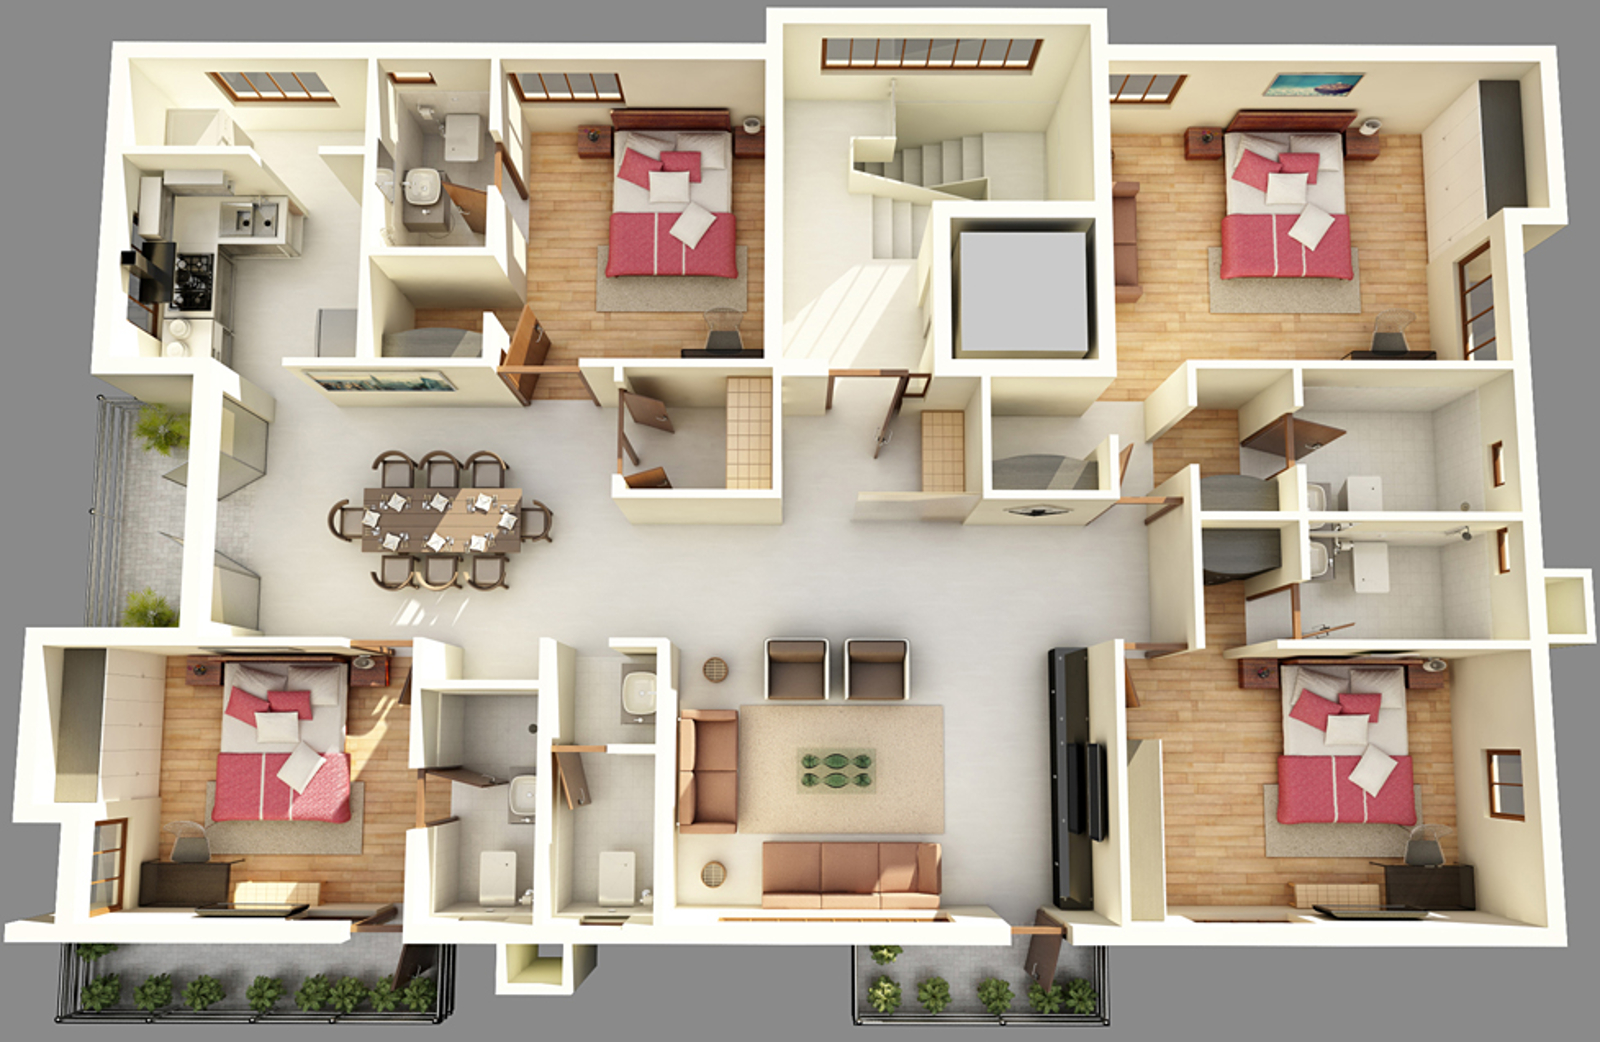 40 Interior Design Cost For 2 Bhk In Chennai